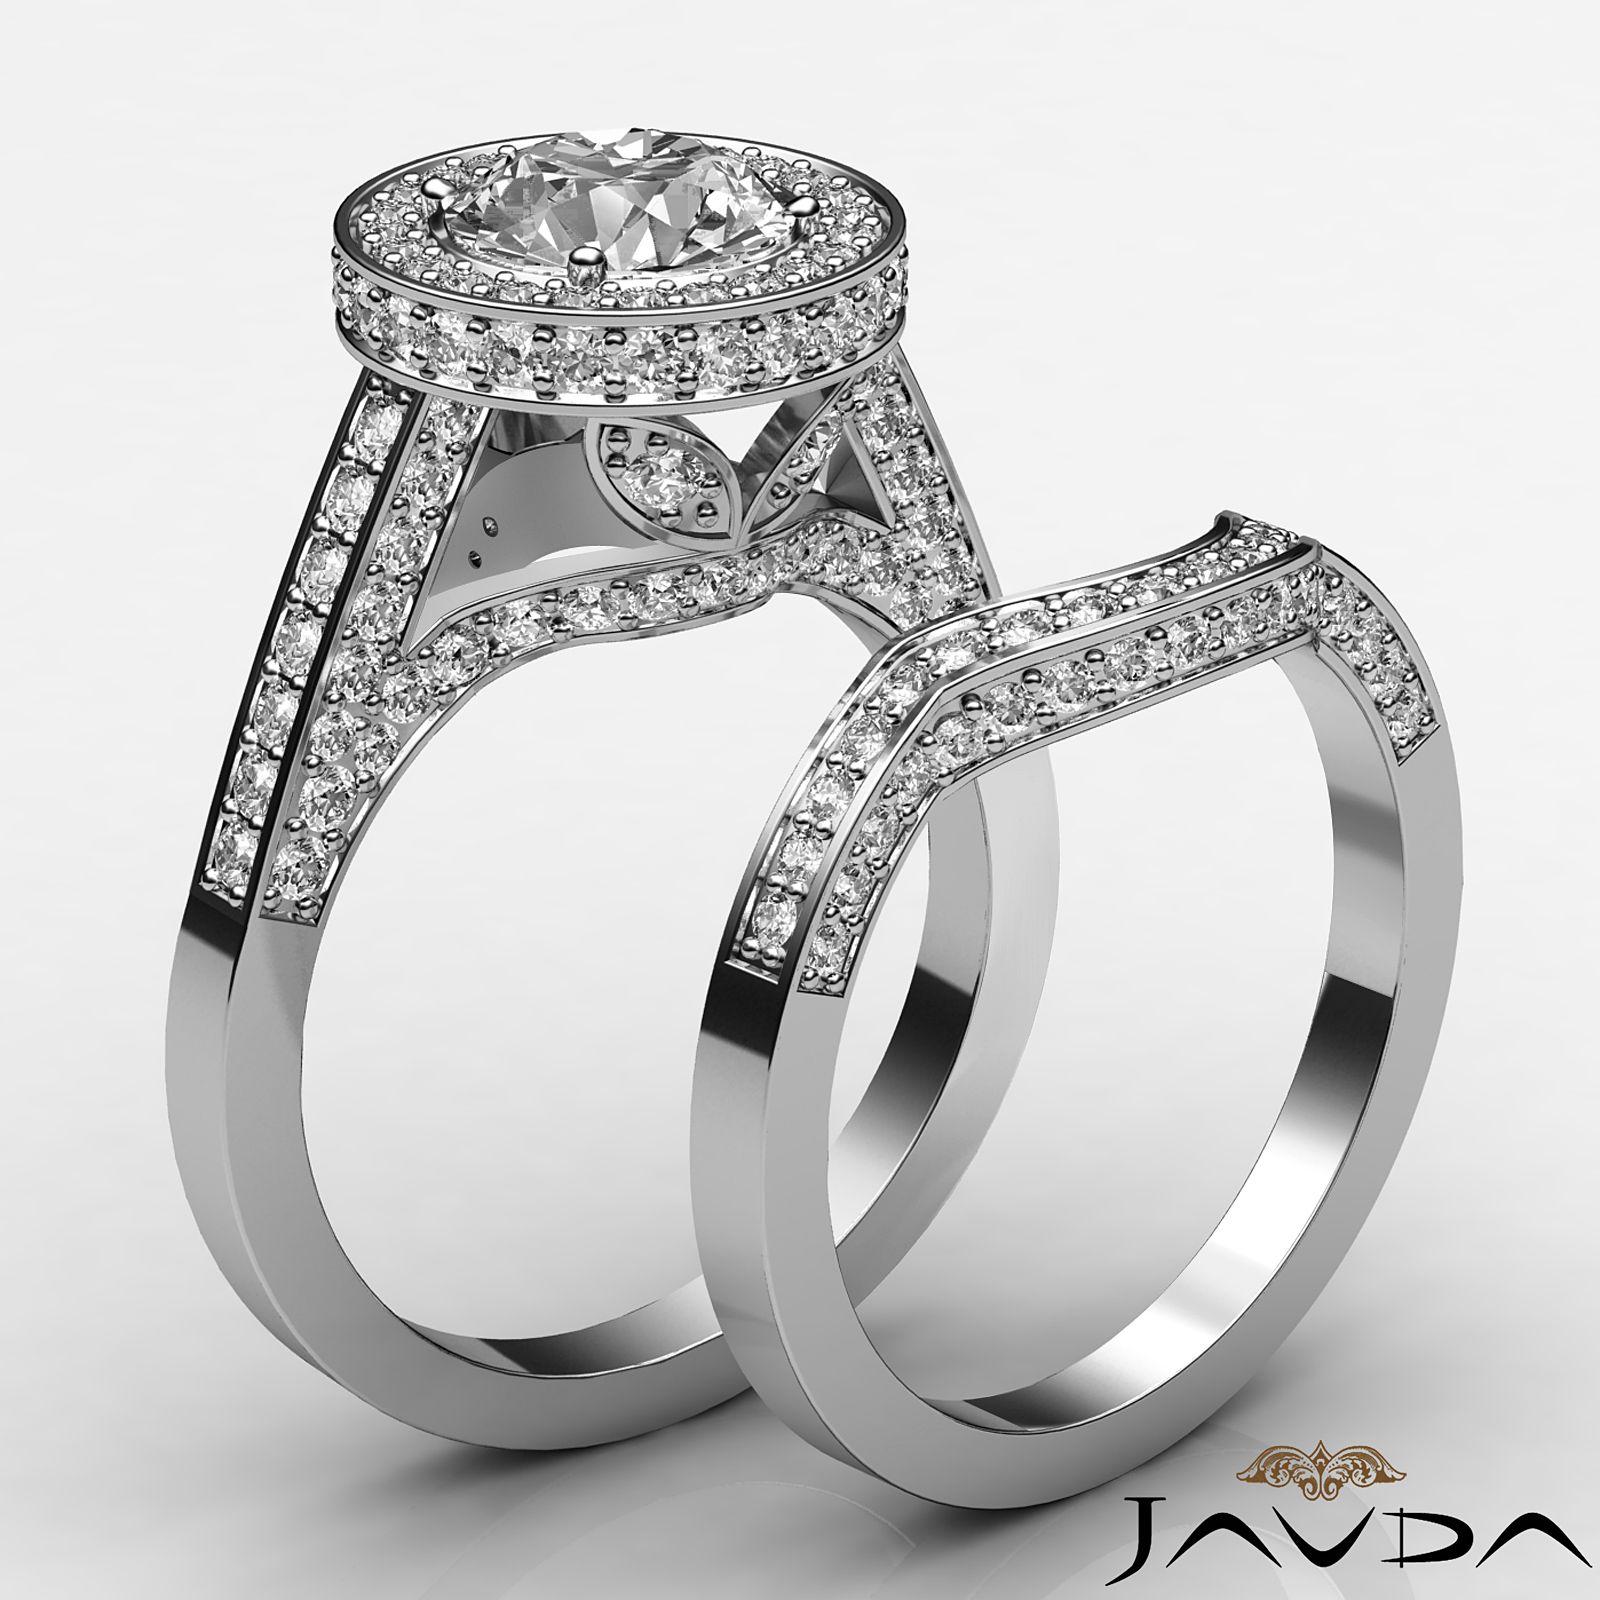 3ct Round Diamond Halo Pave Engagement Bridal Set Ring GIA